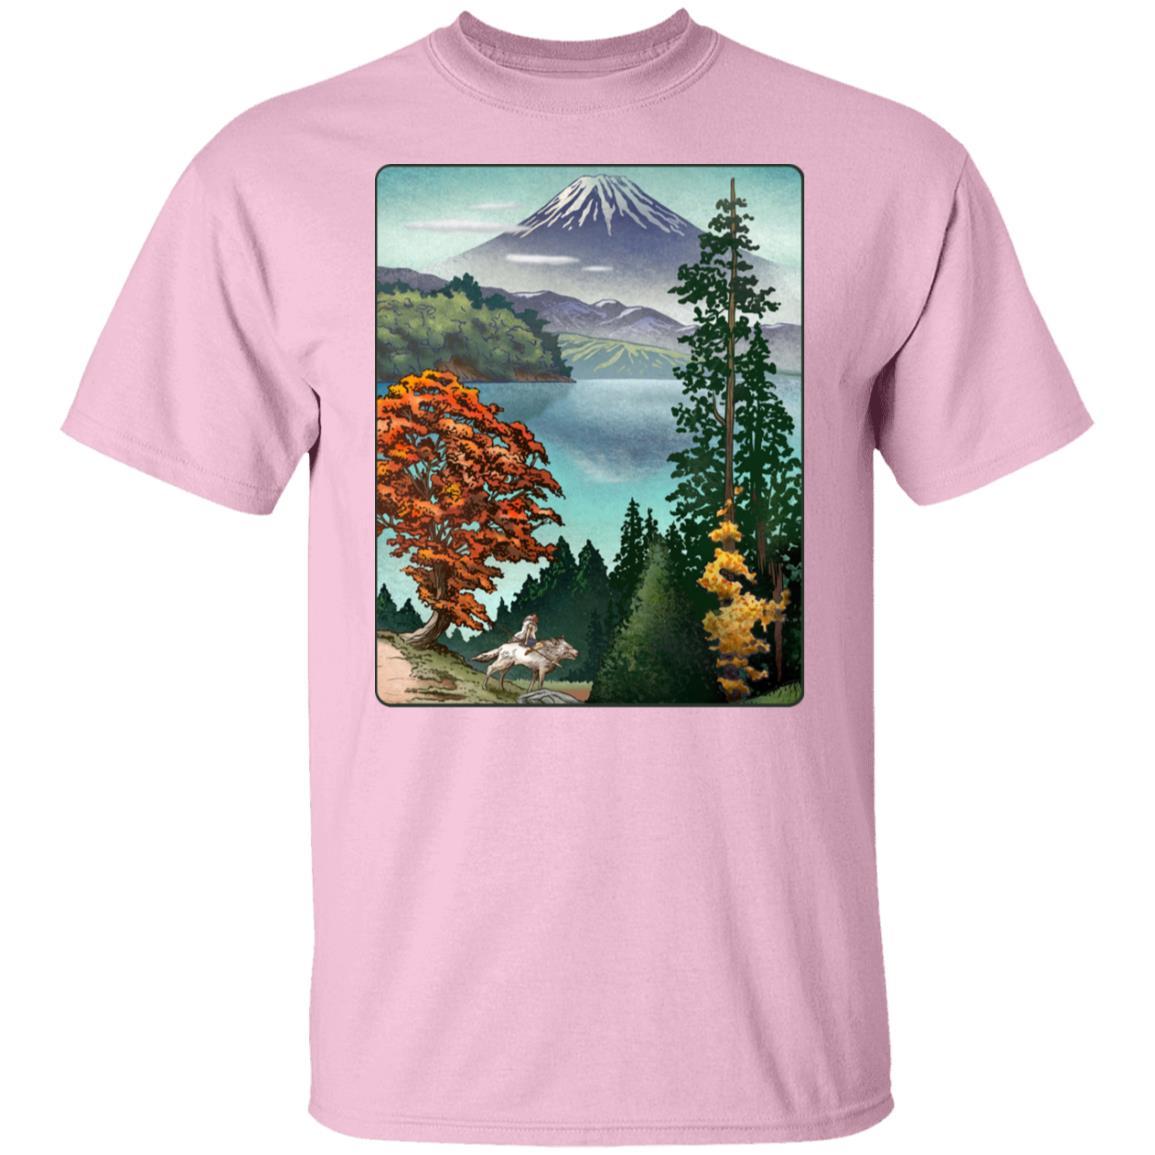 Princess Mononoke Landscape T Shirt